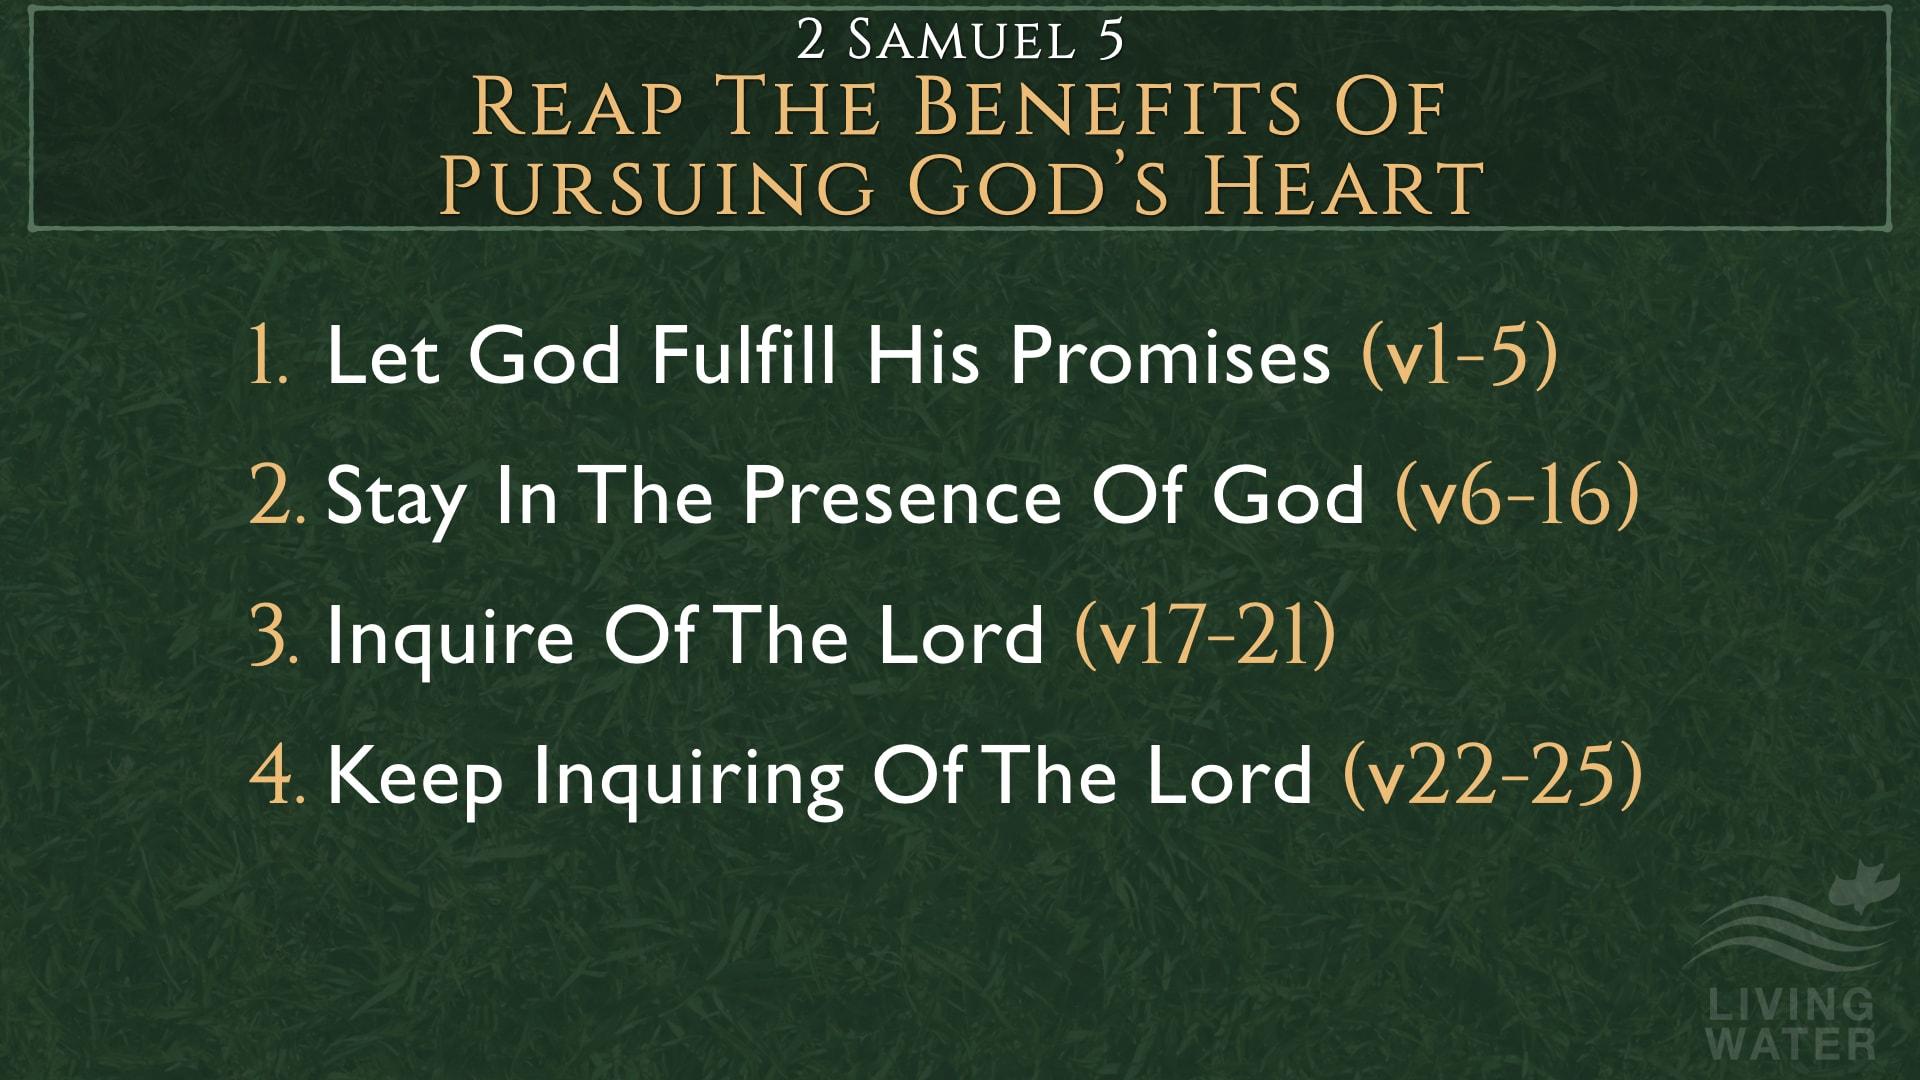 2 Samuel 5, Reap The Benefits Of Pursuing God's Heart